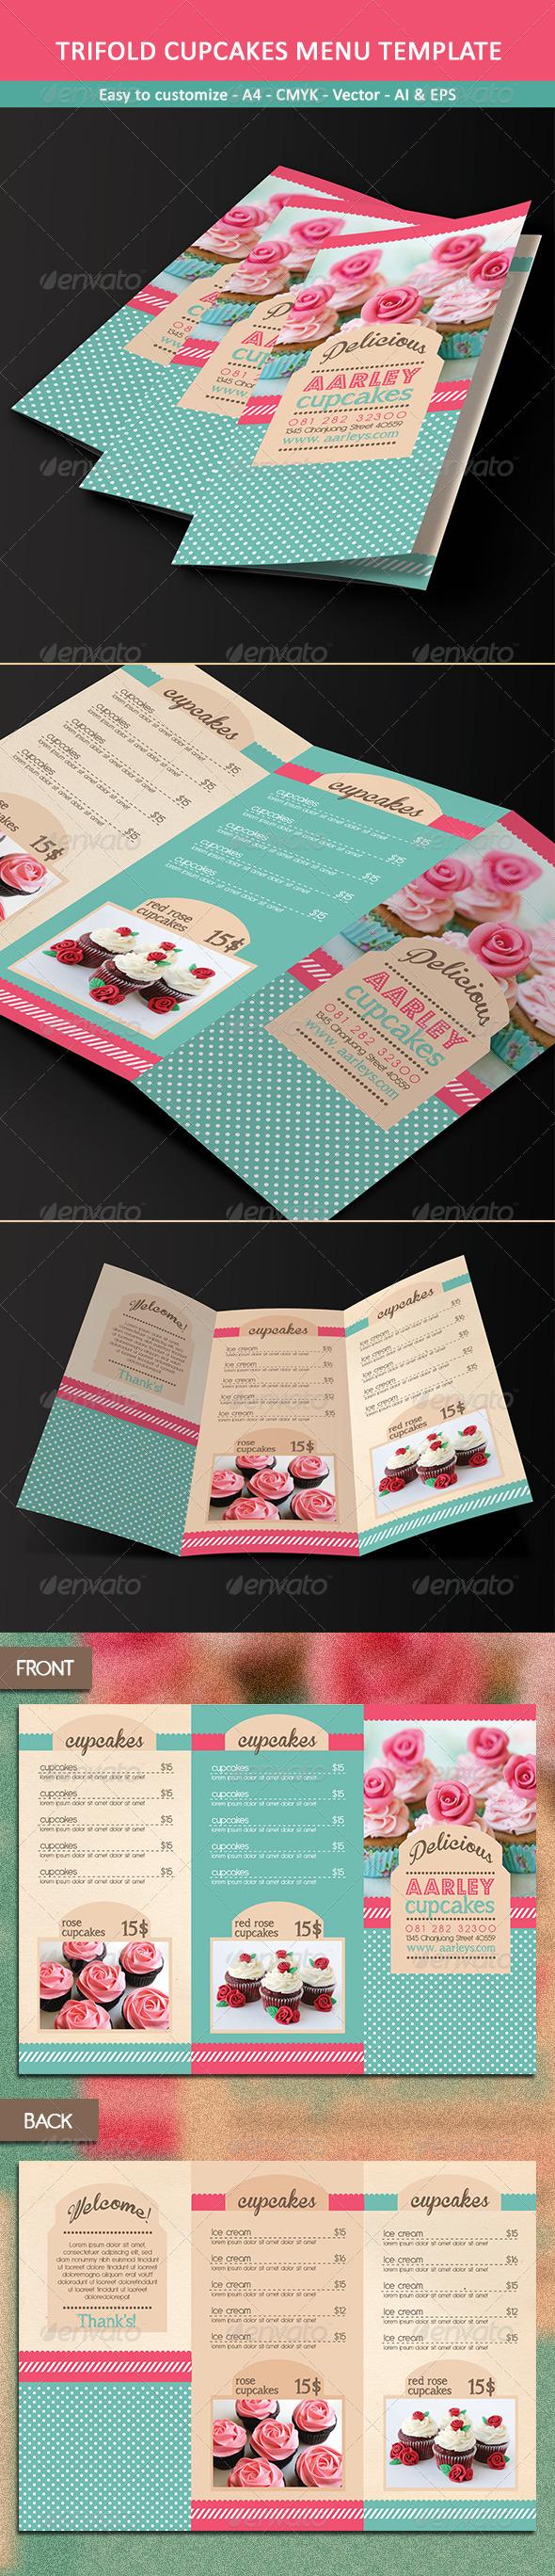 Trifold Cupcakes Menu Template - Food Menus Print Templates